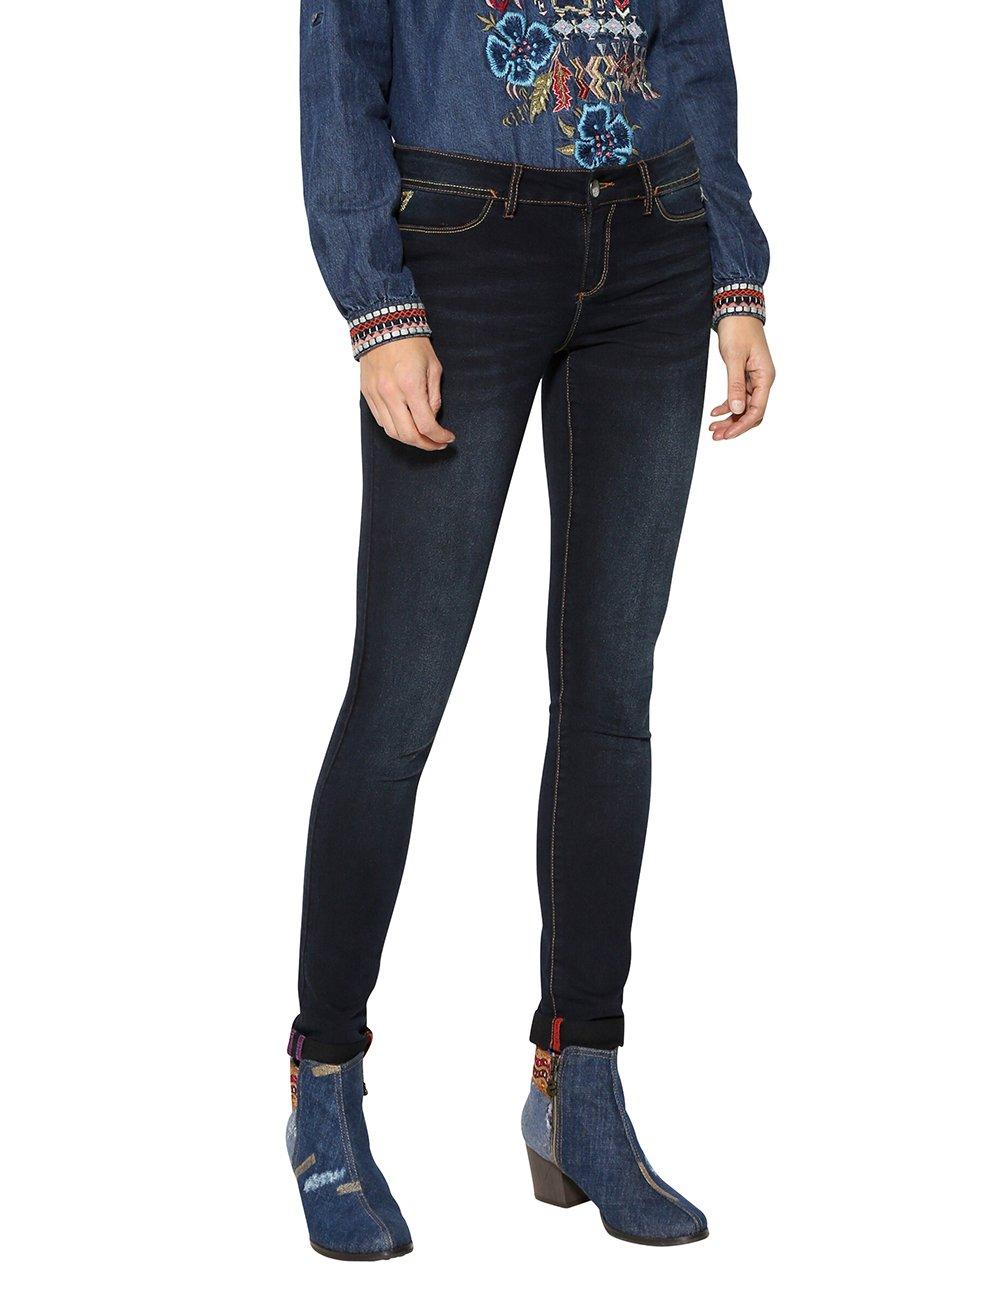 Desigual Denim_Second Skin Jeans Ajustados para Mujer product image